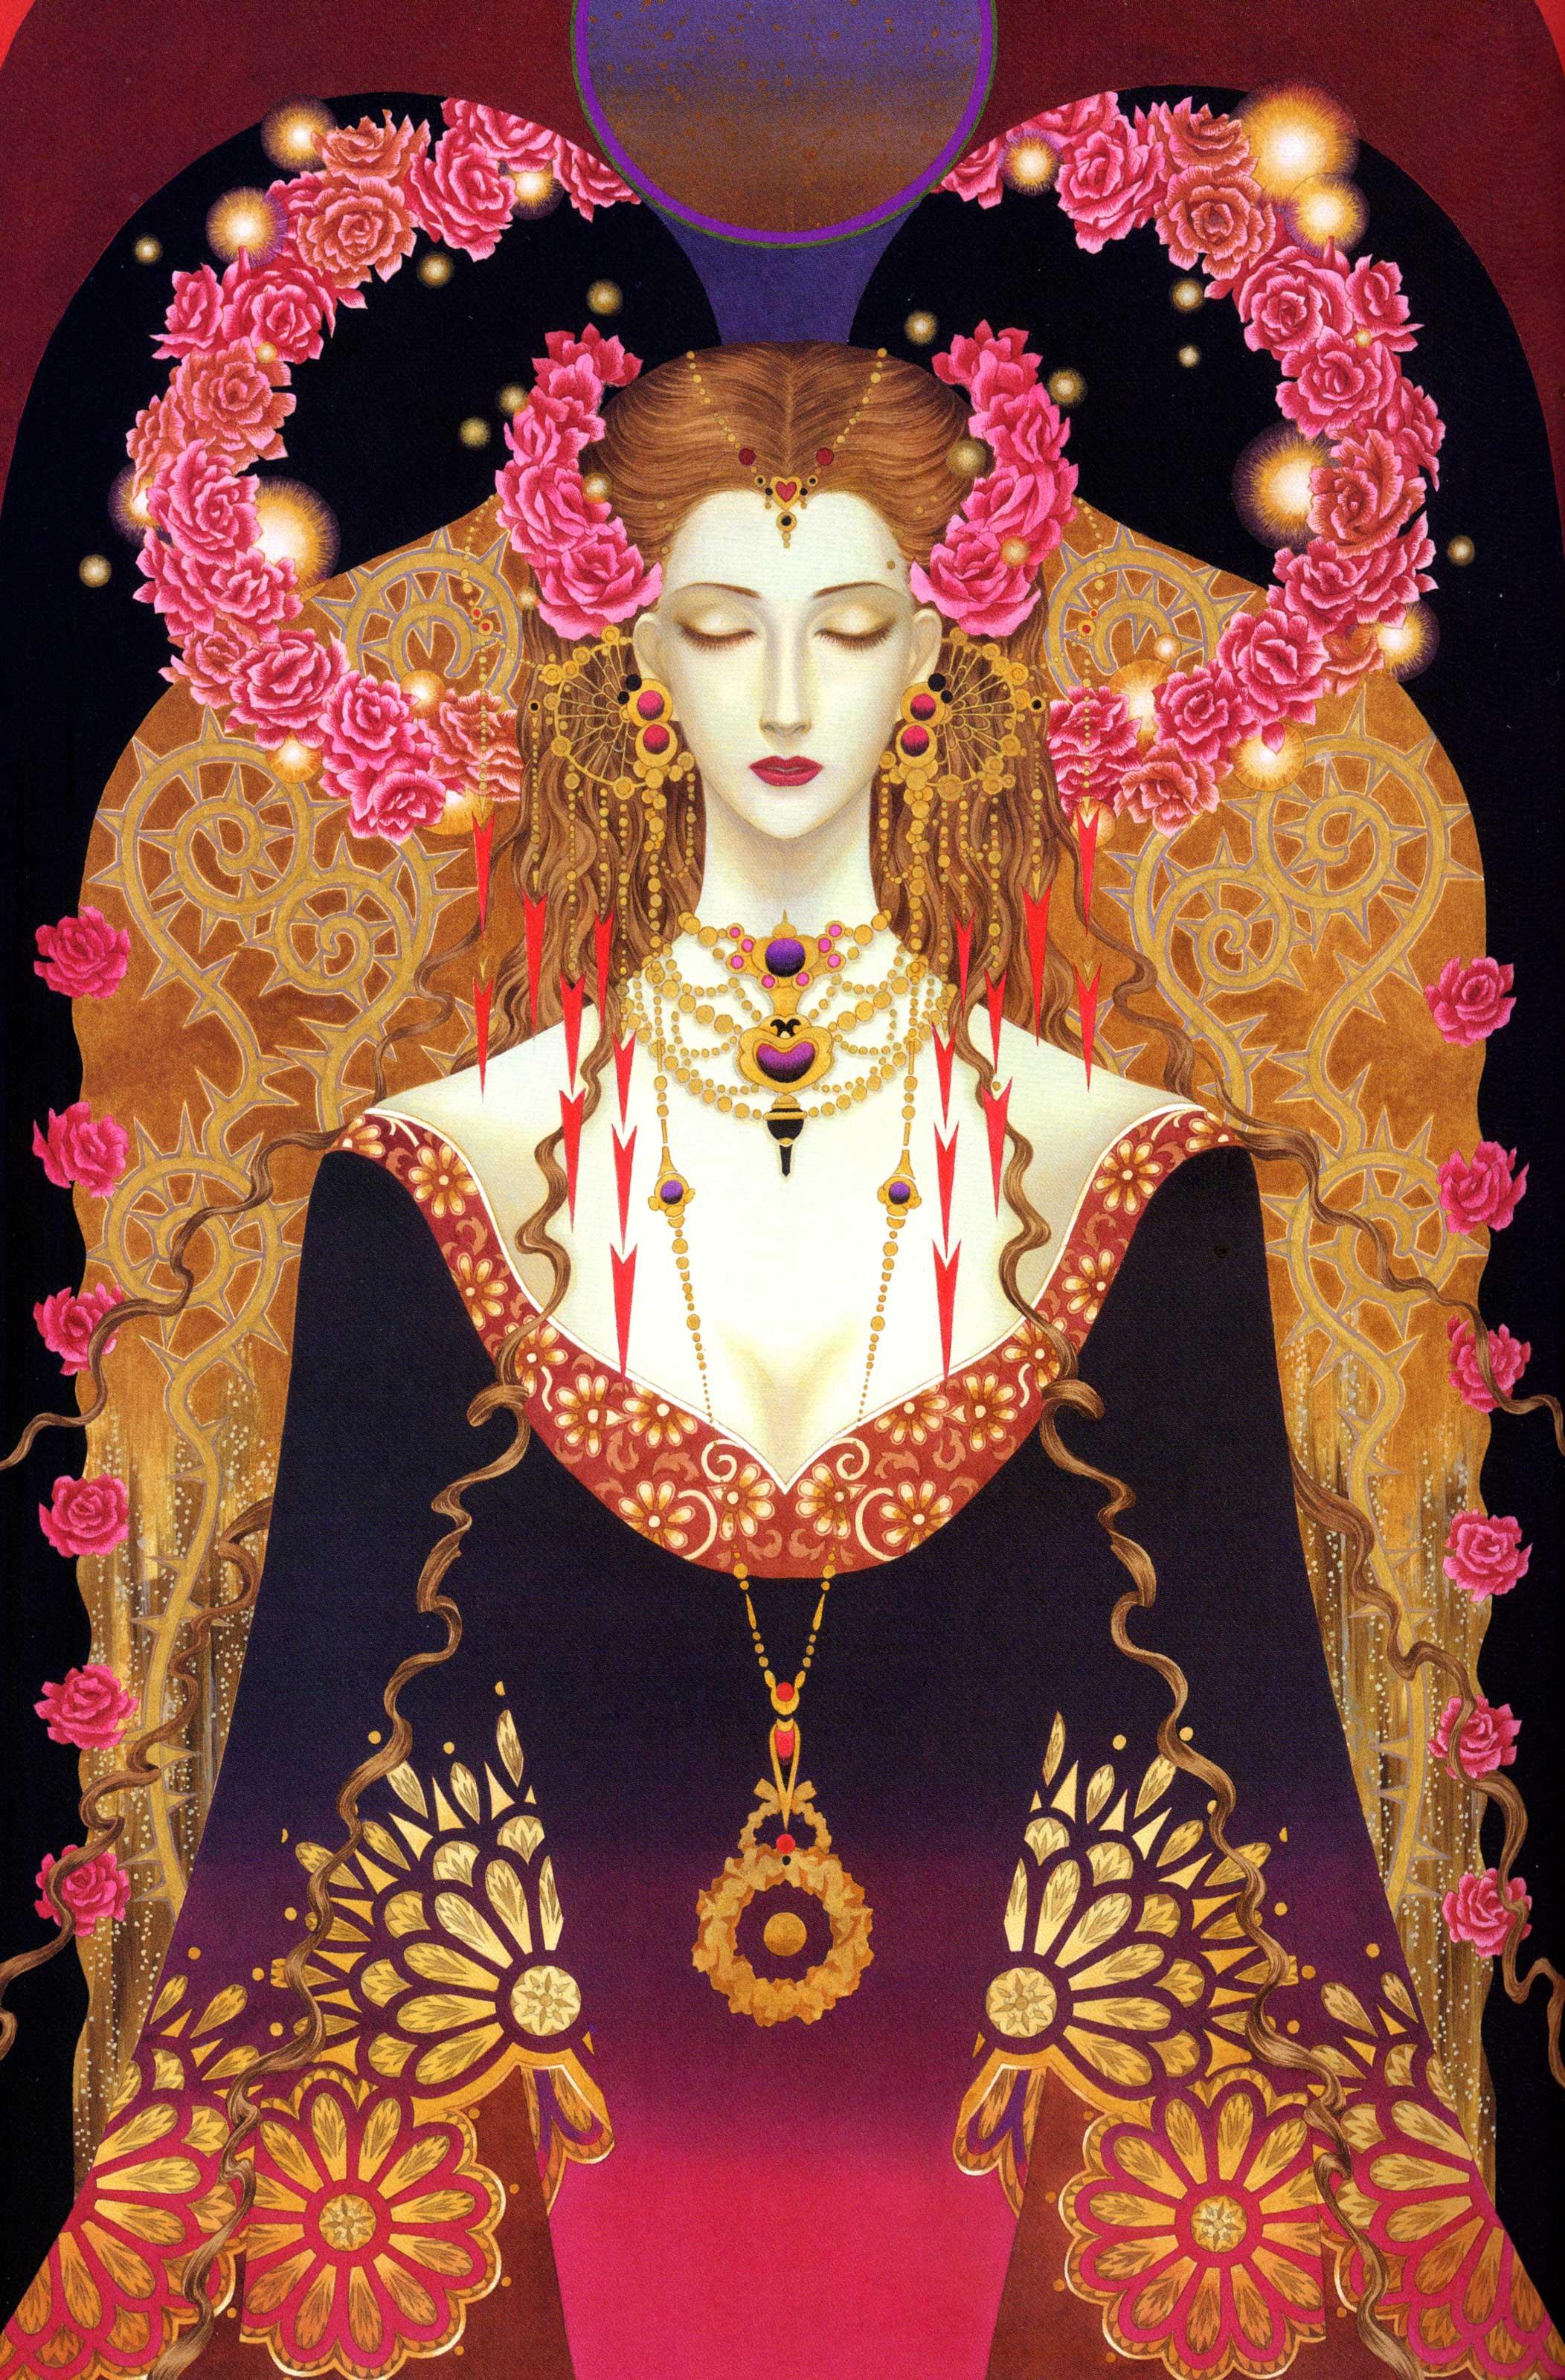 Toshiaki kato illustrations on pinterest femme fatale - Steamgirl download ...